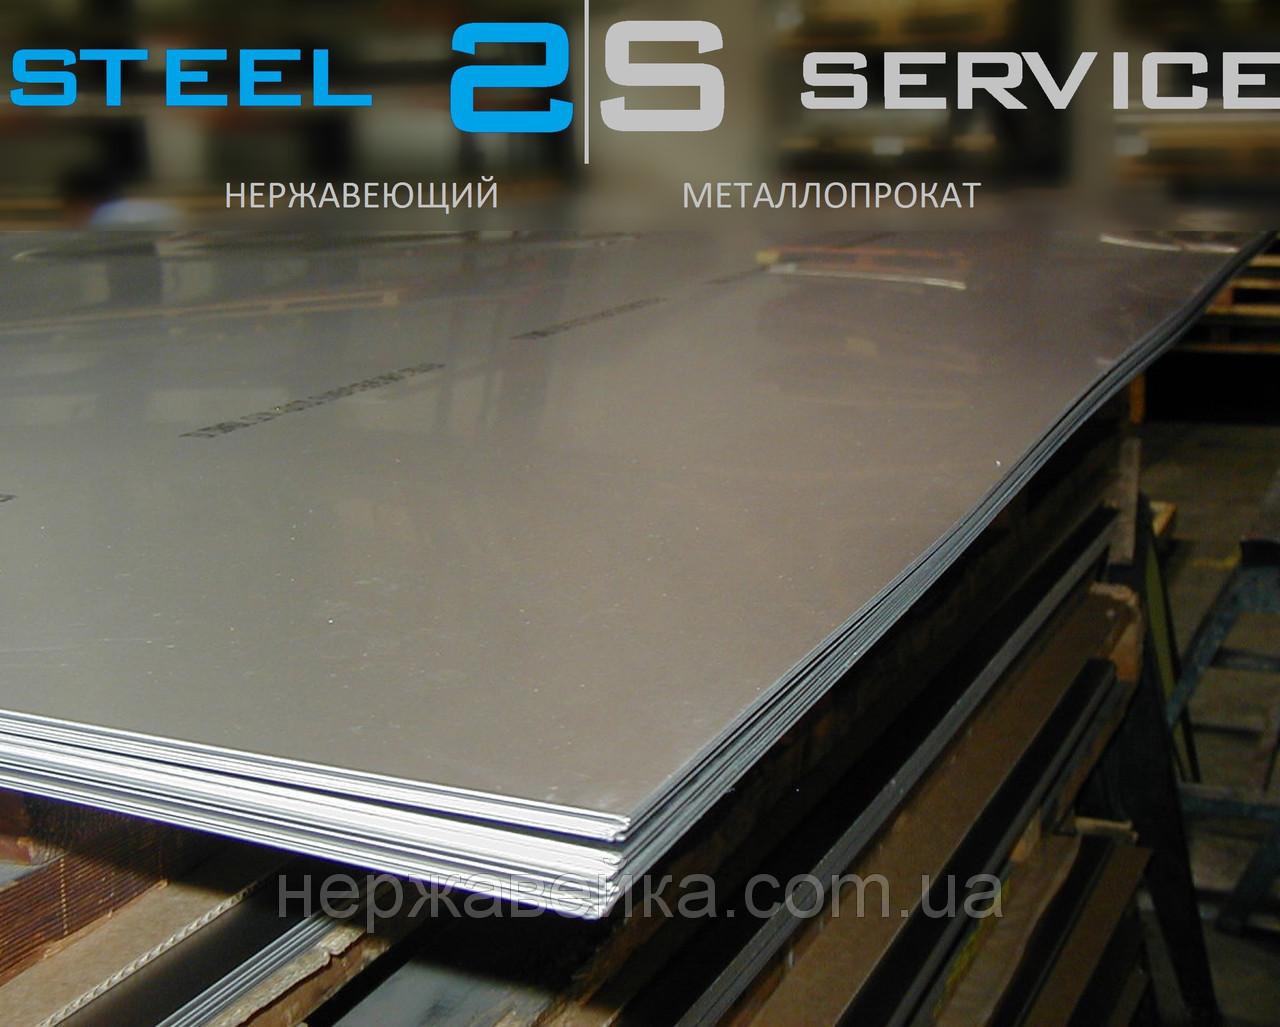 Листовая нержавейка 4х1500х6000мм AISI 410S(08Х13) F1 - горячекатанный, технический